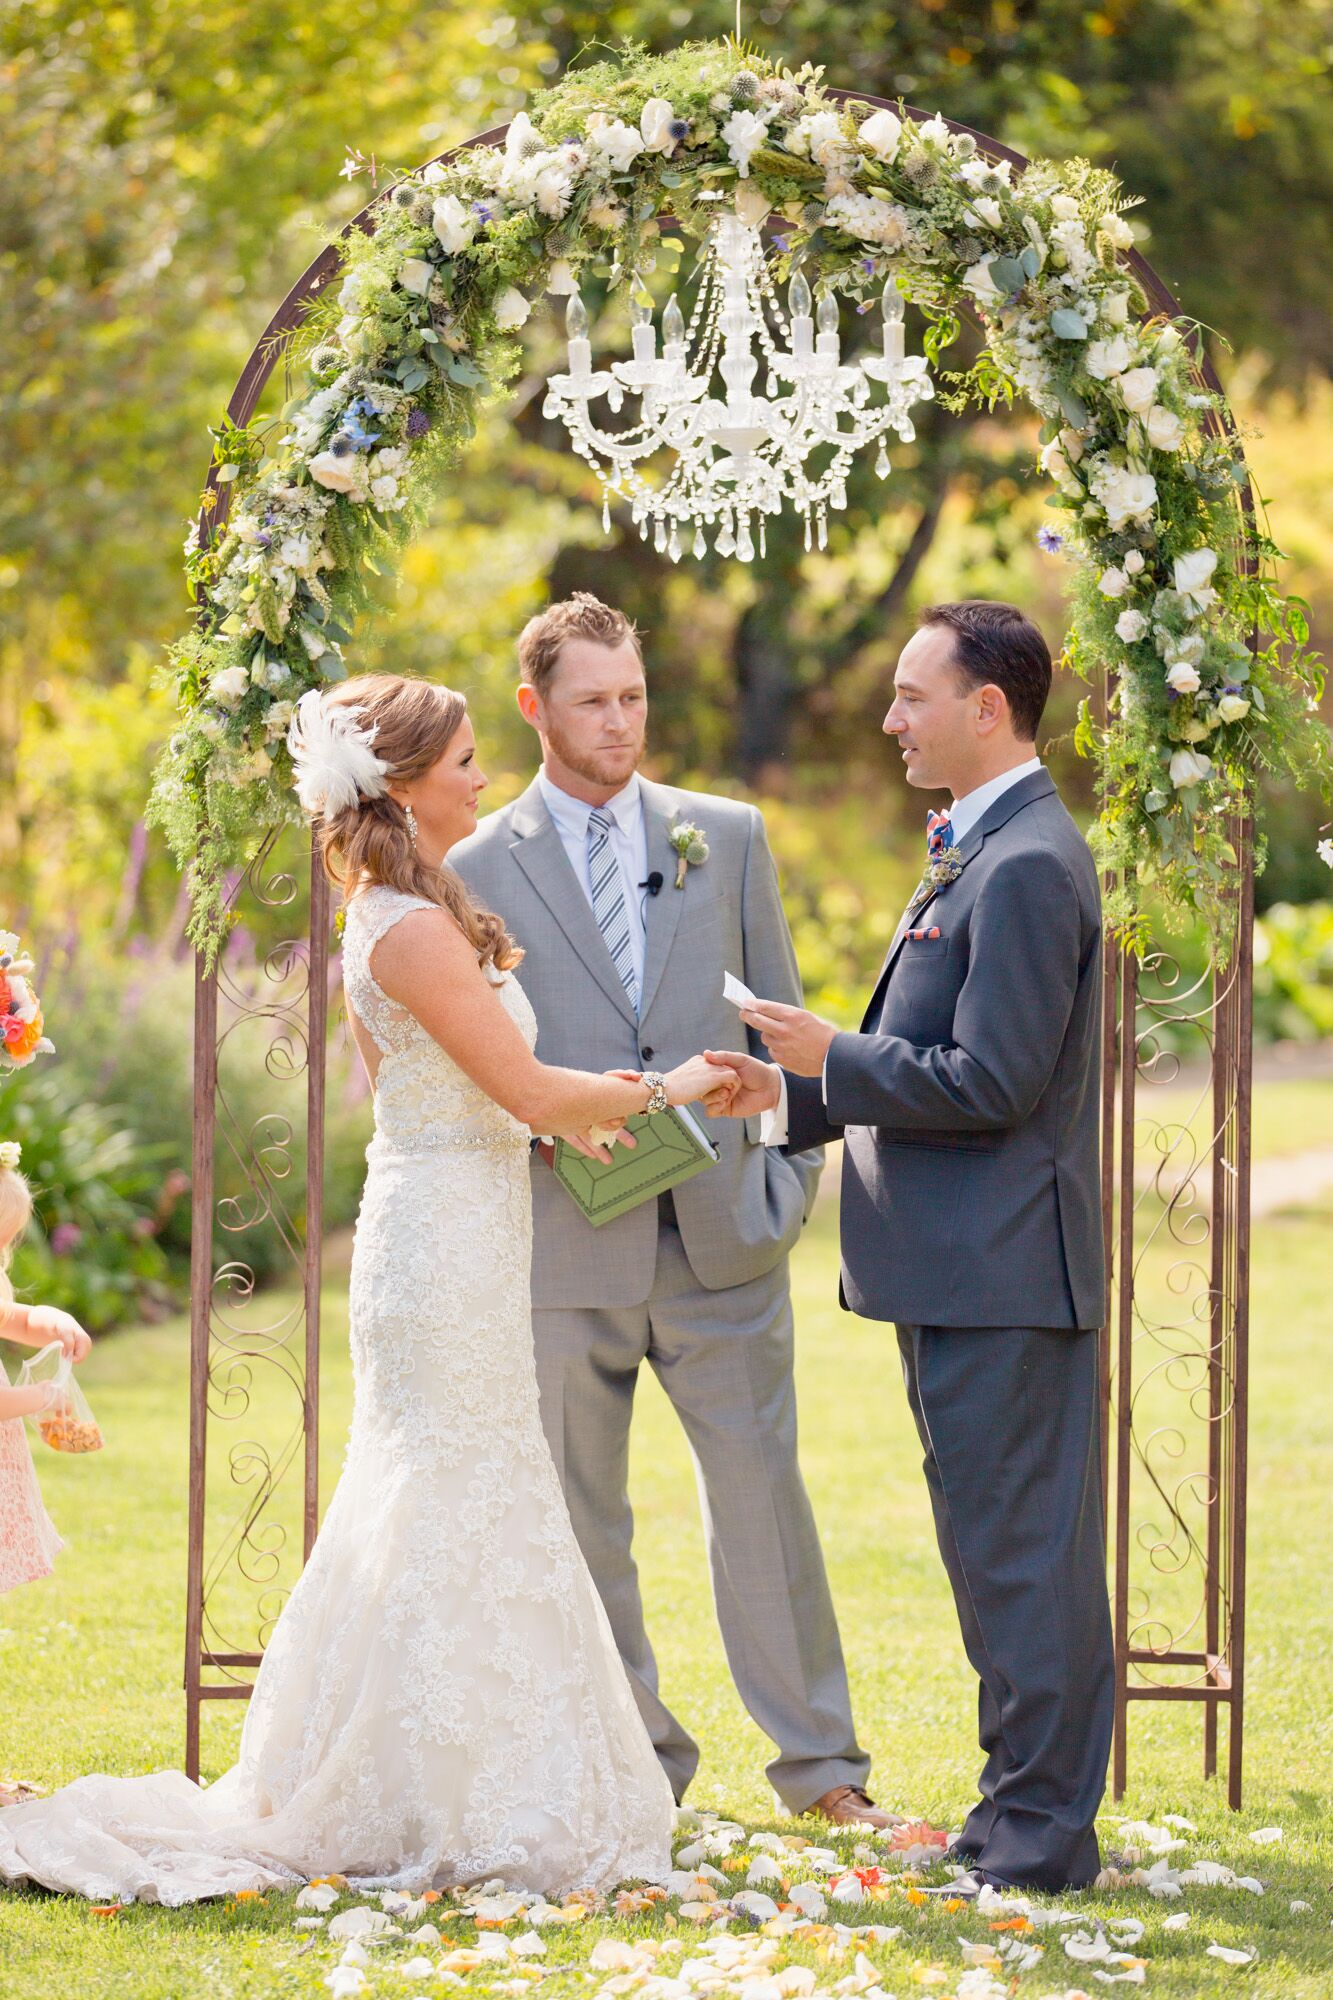 Iron Wedding Arch With Elegant Chandelier